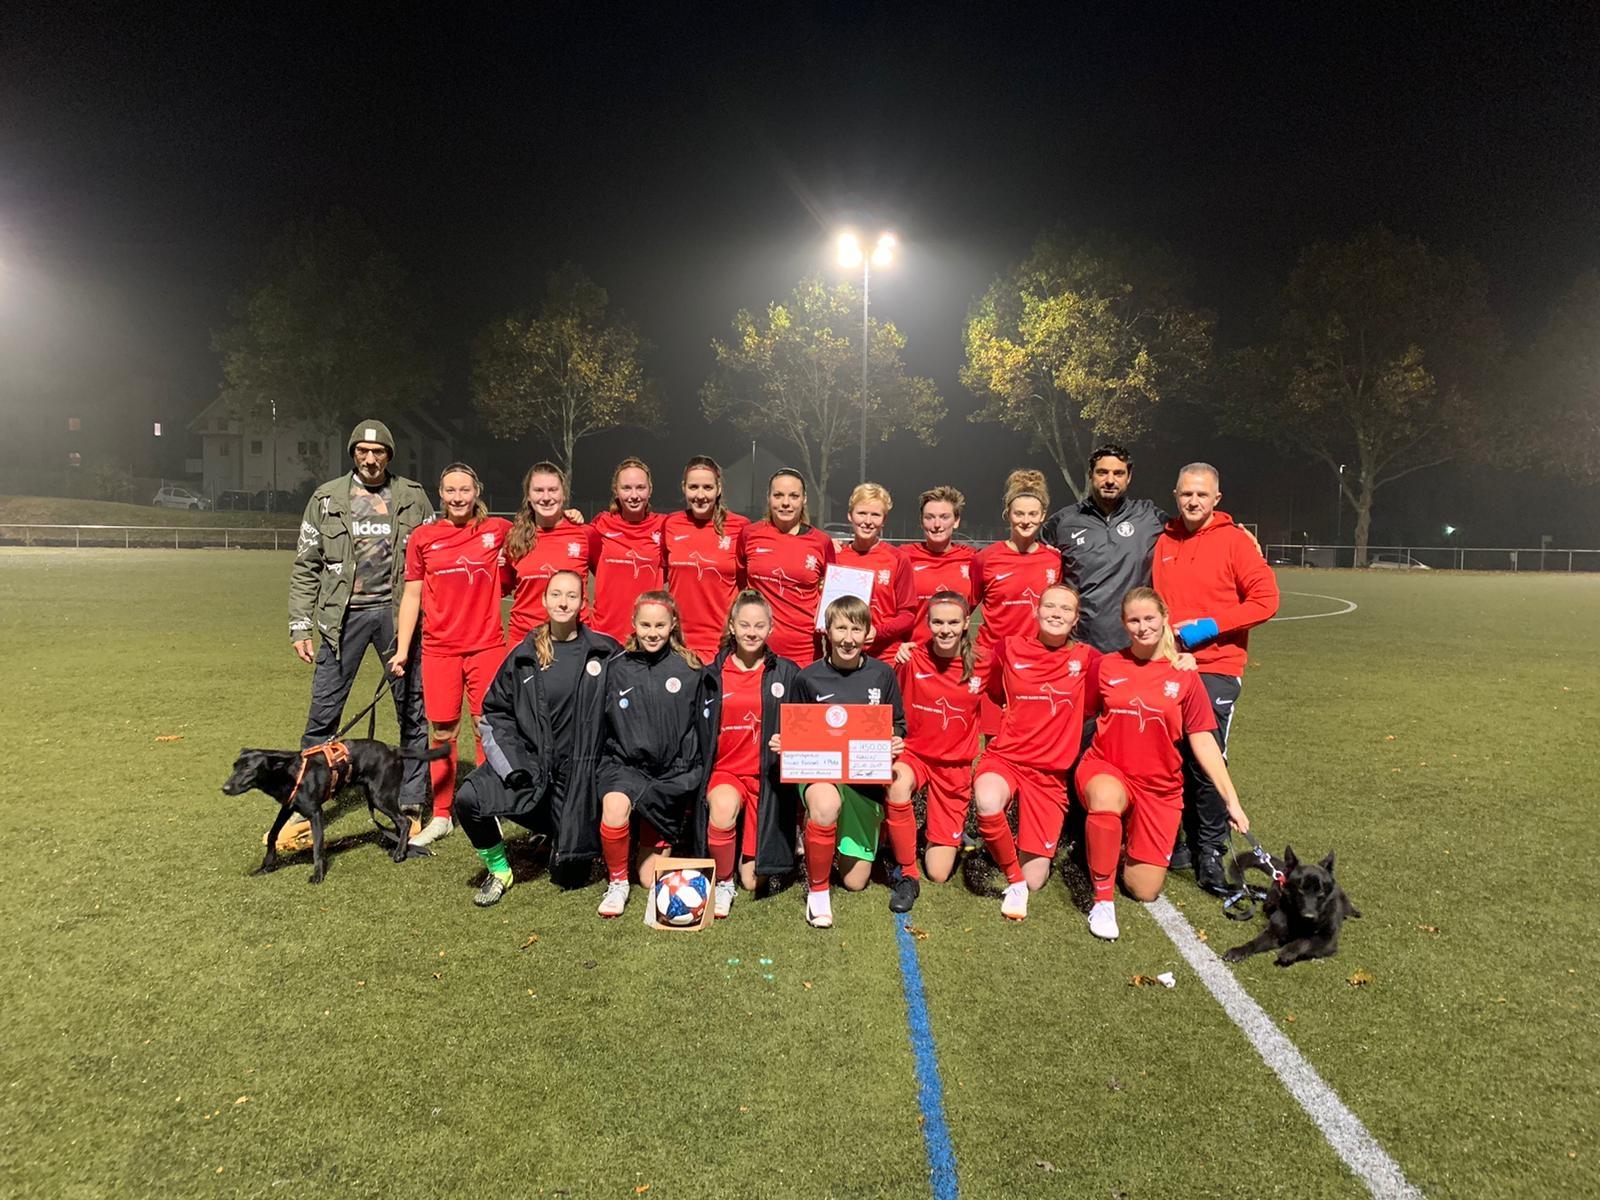 Regionalpokalfinale